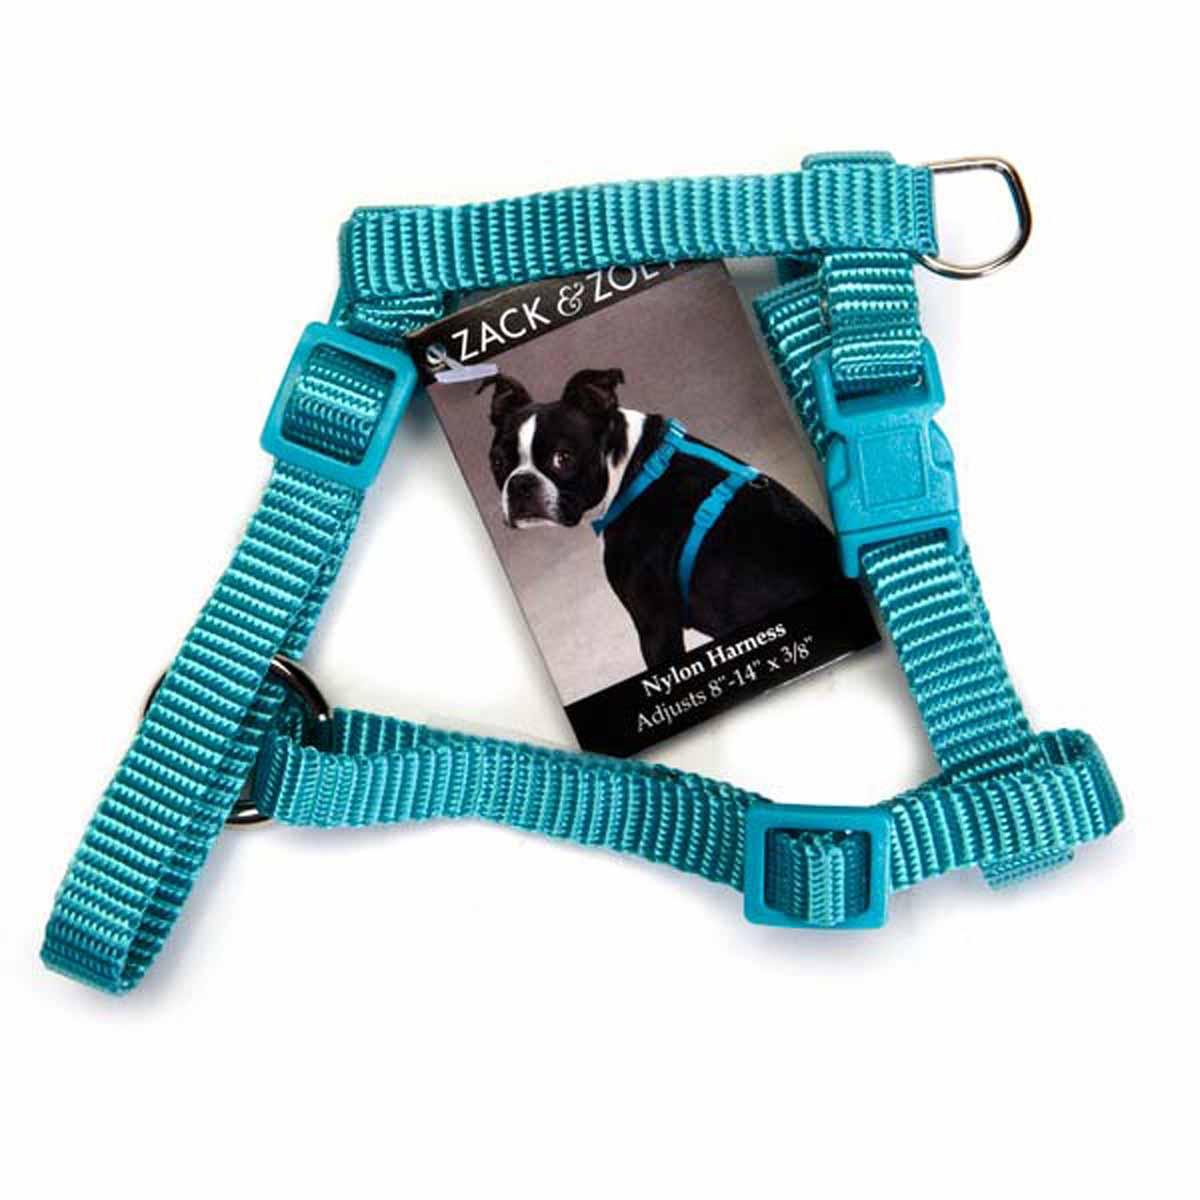 Nylon Dog Harness by Zack & Zoey - Bluebird